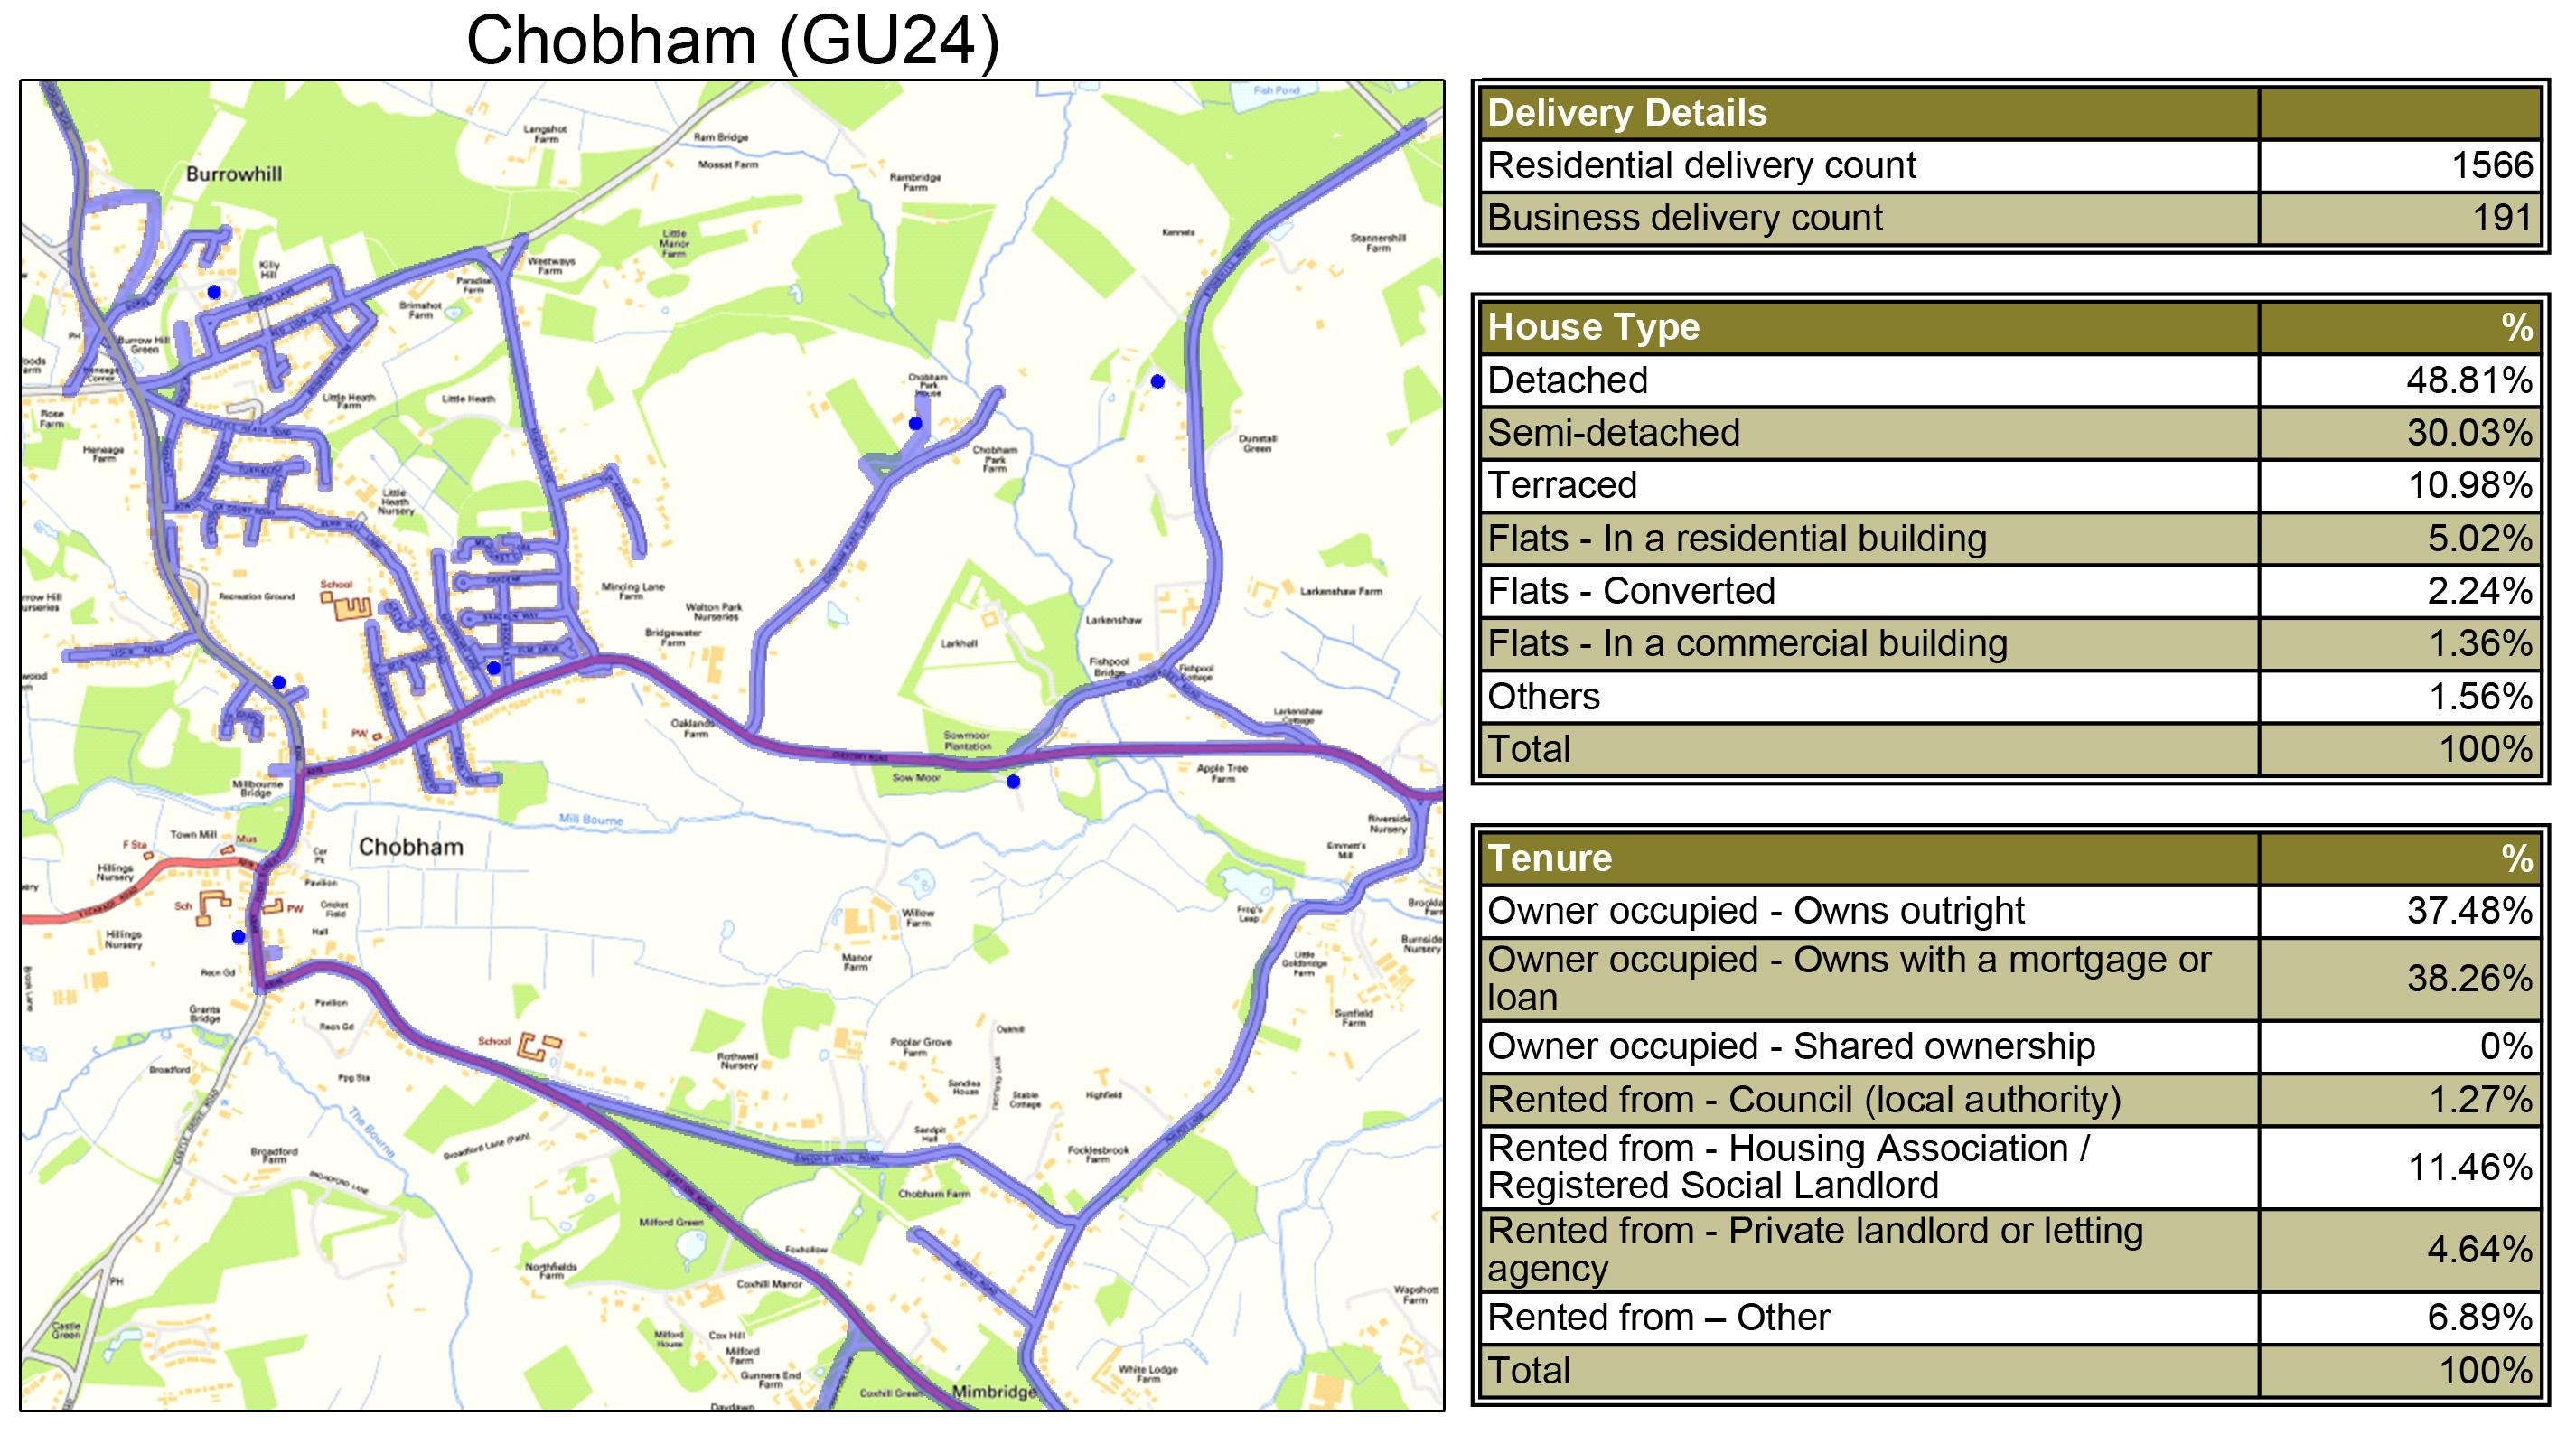 Leaflet Distribution Chobham - Geoplan Image